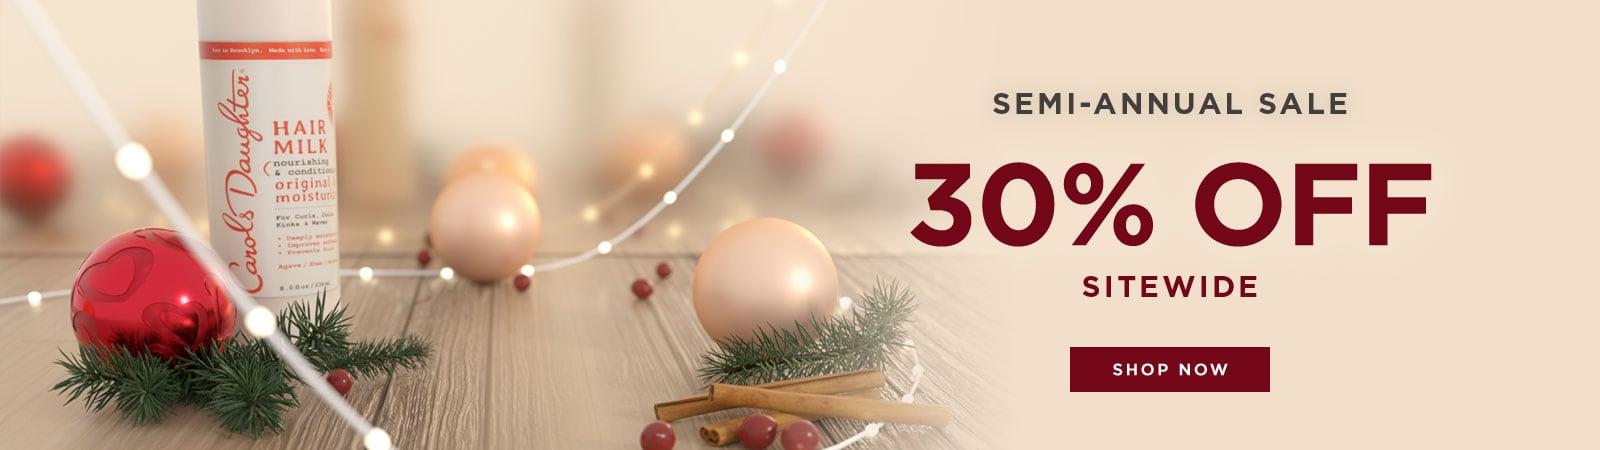 30% Off Sitewide. Shop Sale.